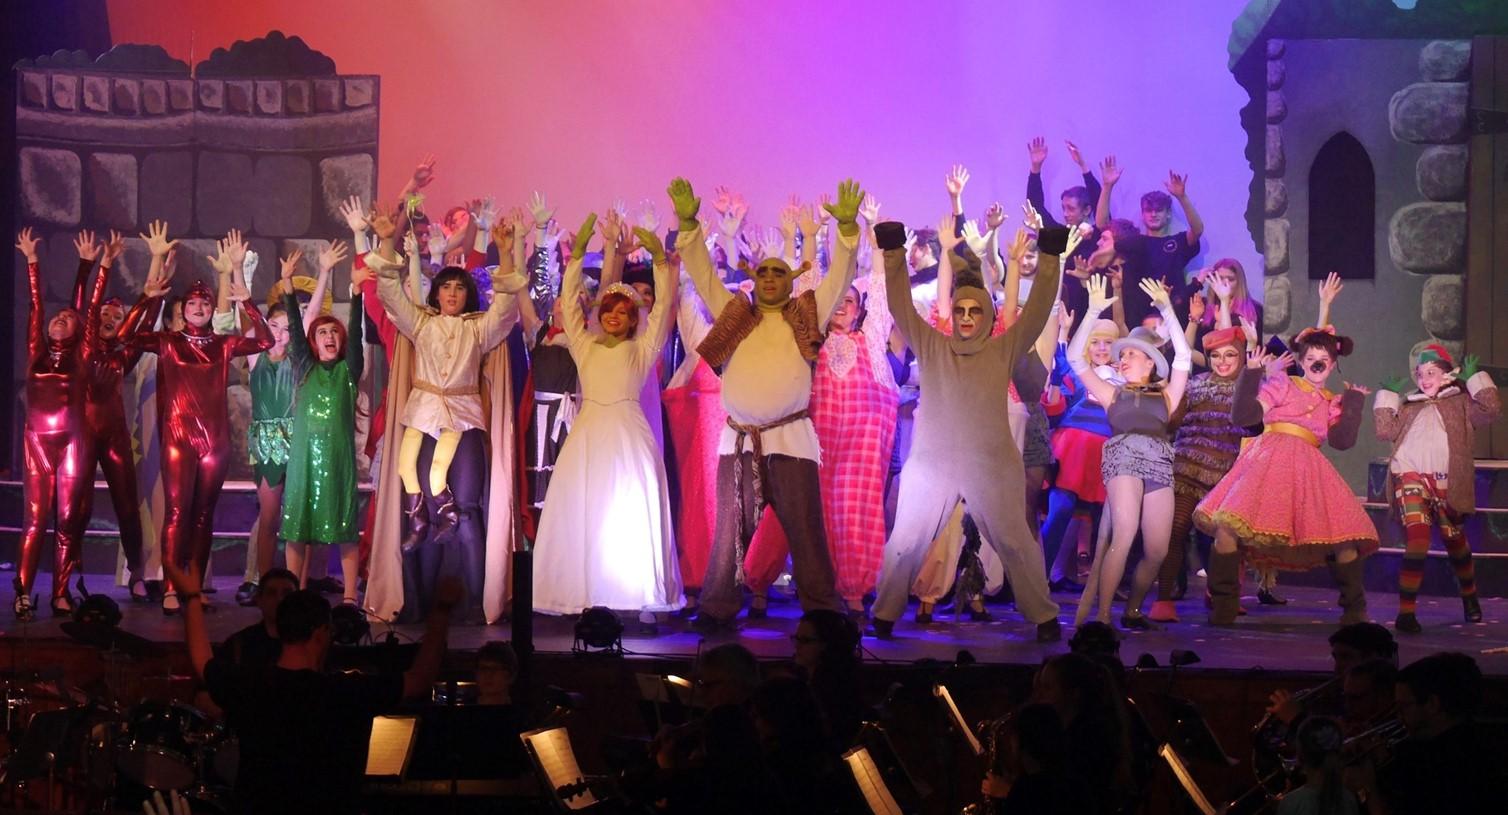 Shrek the Musical March 28-31